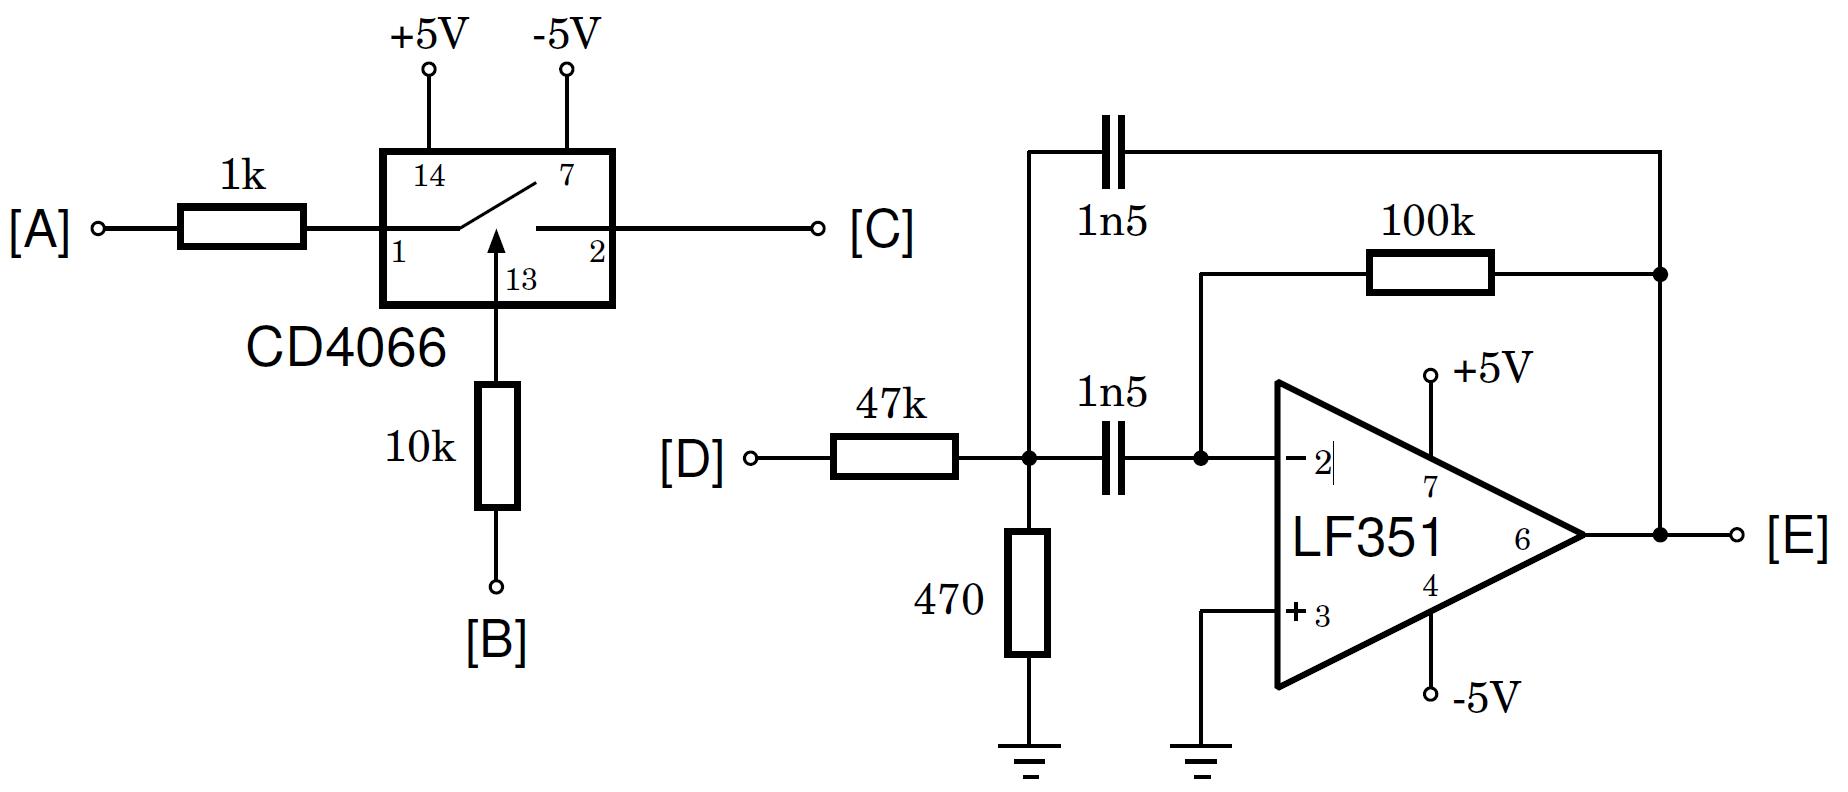 Electronic Circuits Page 87 Next